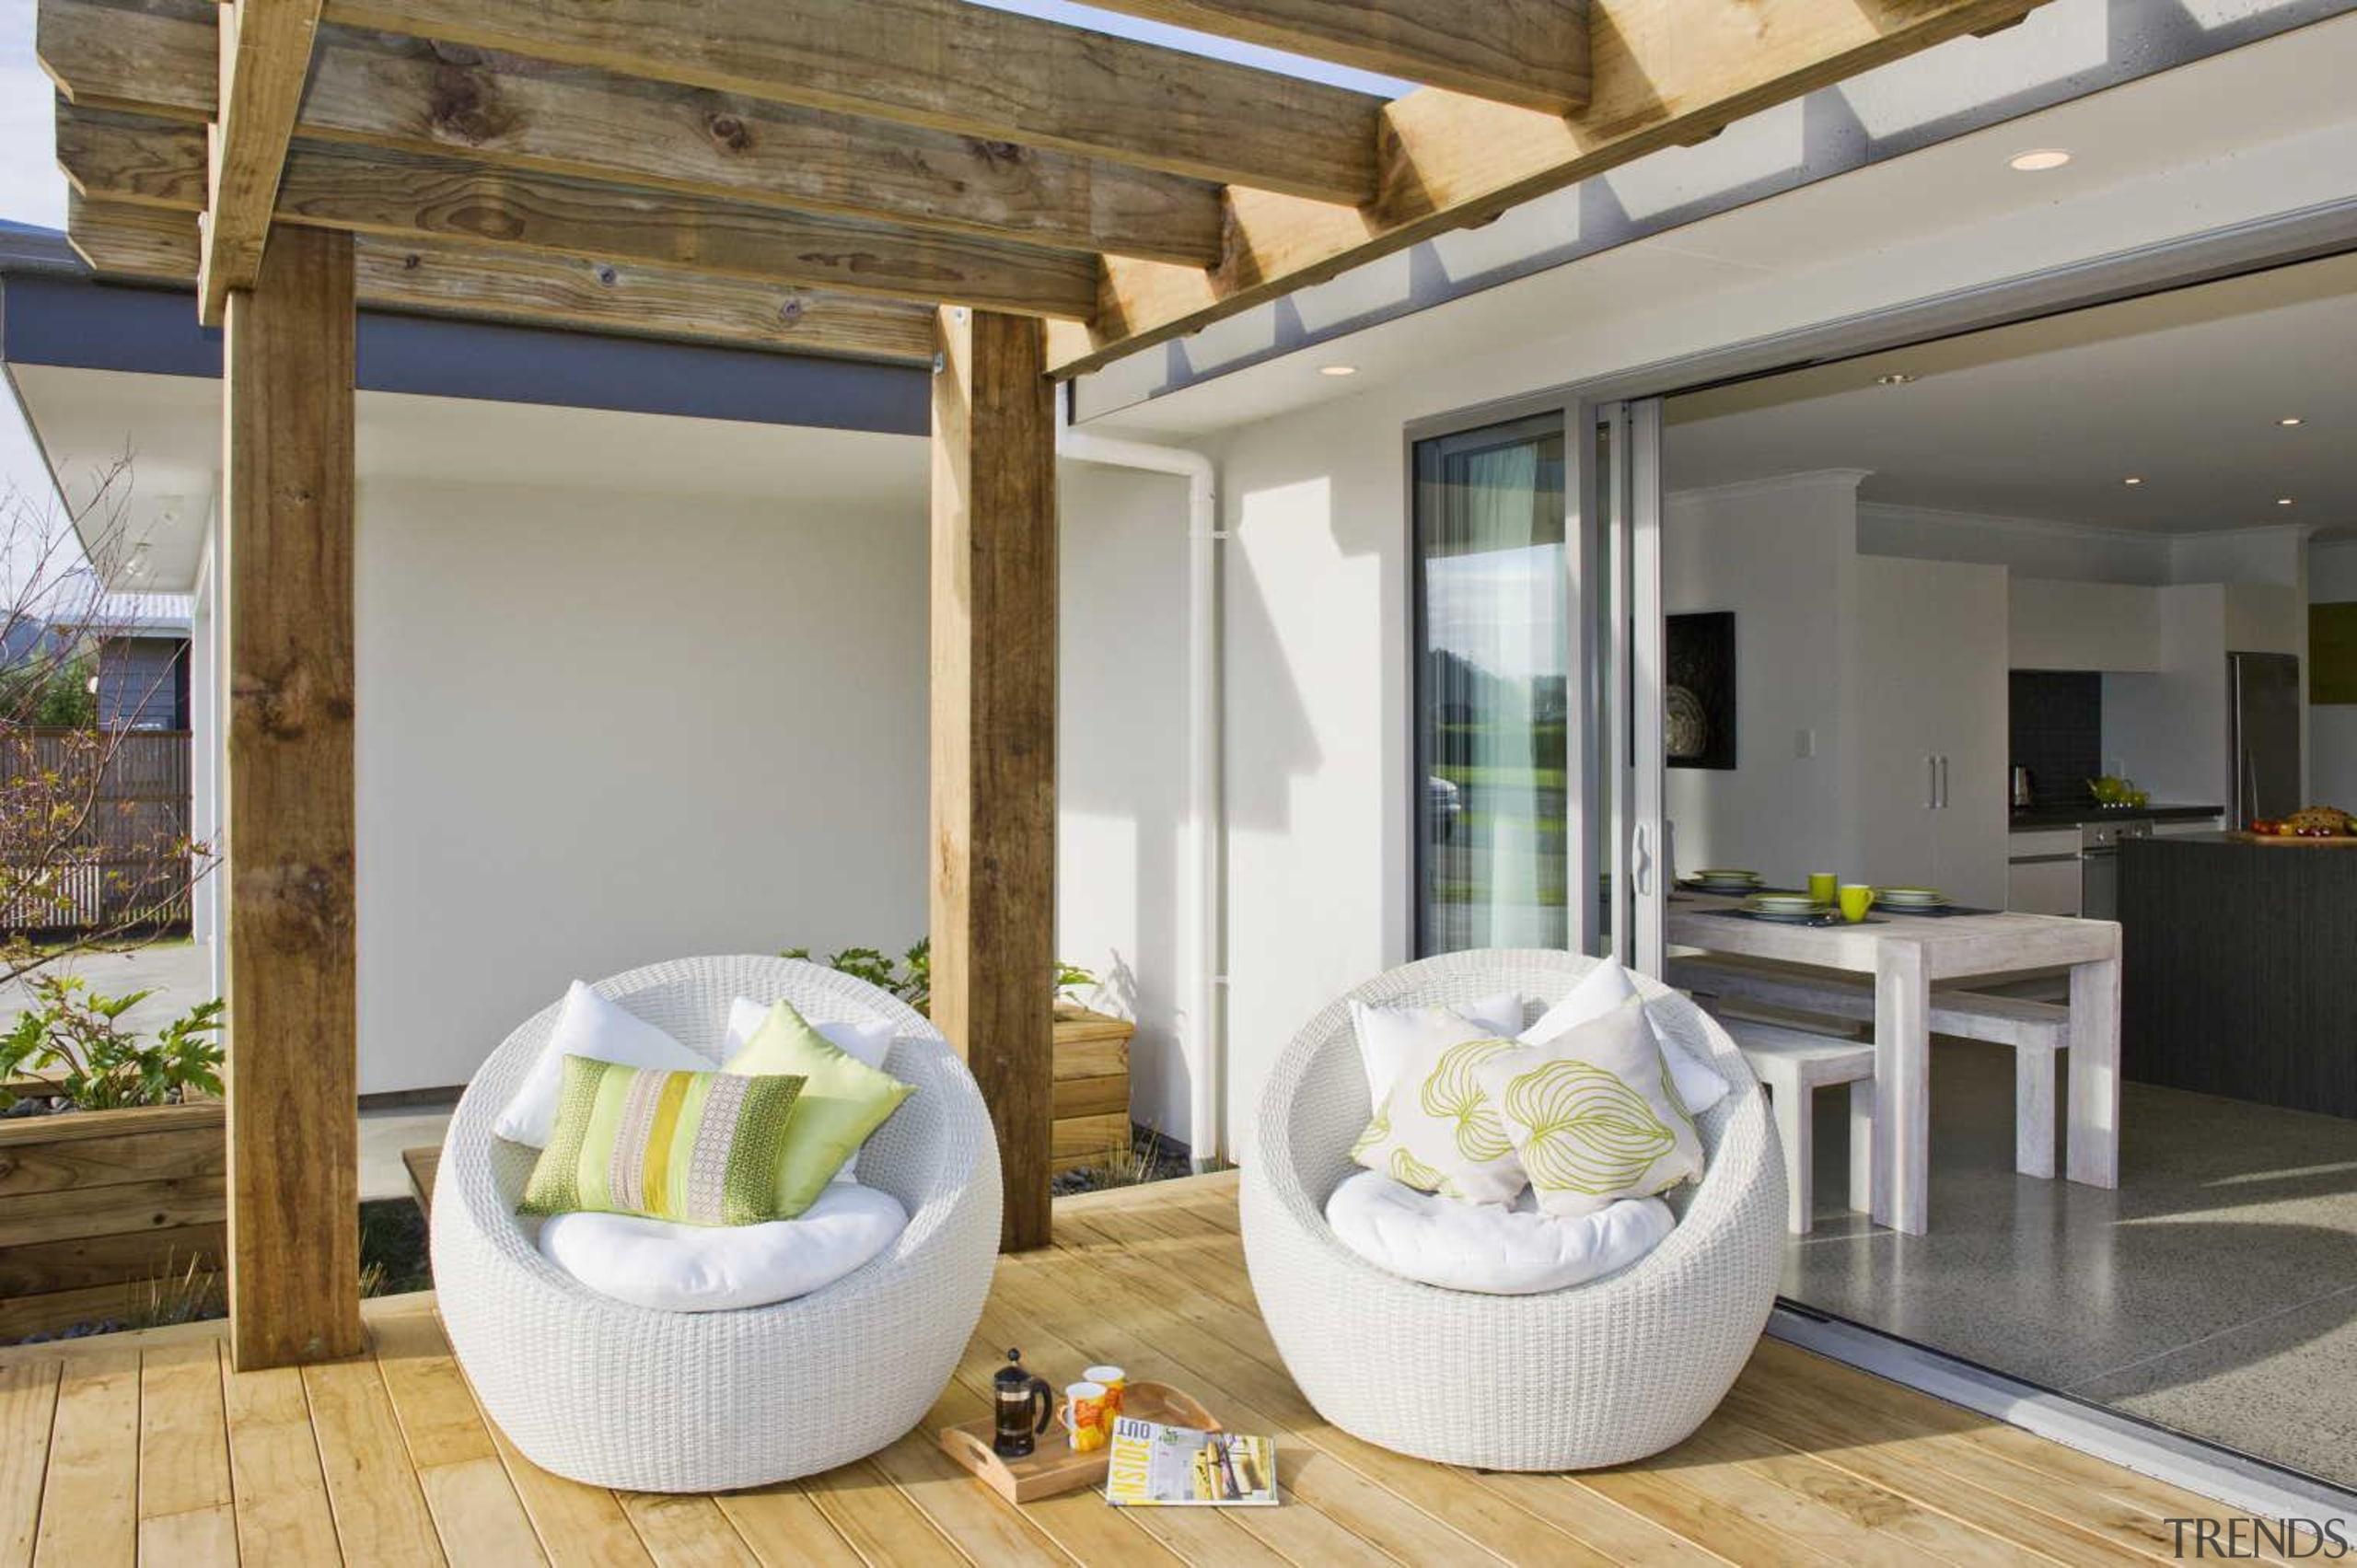 Deck - estate | home | house | estate, home, house, interior design, living room, real estate, gray